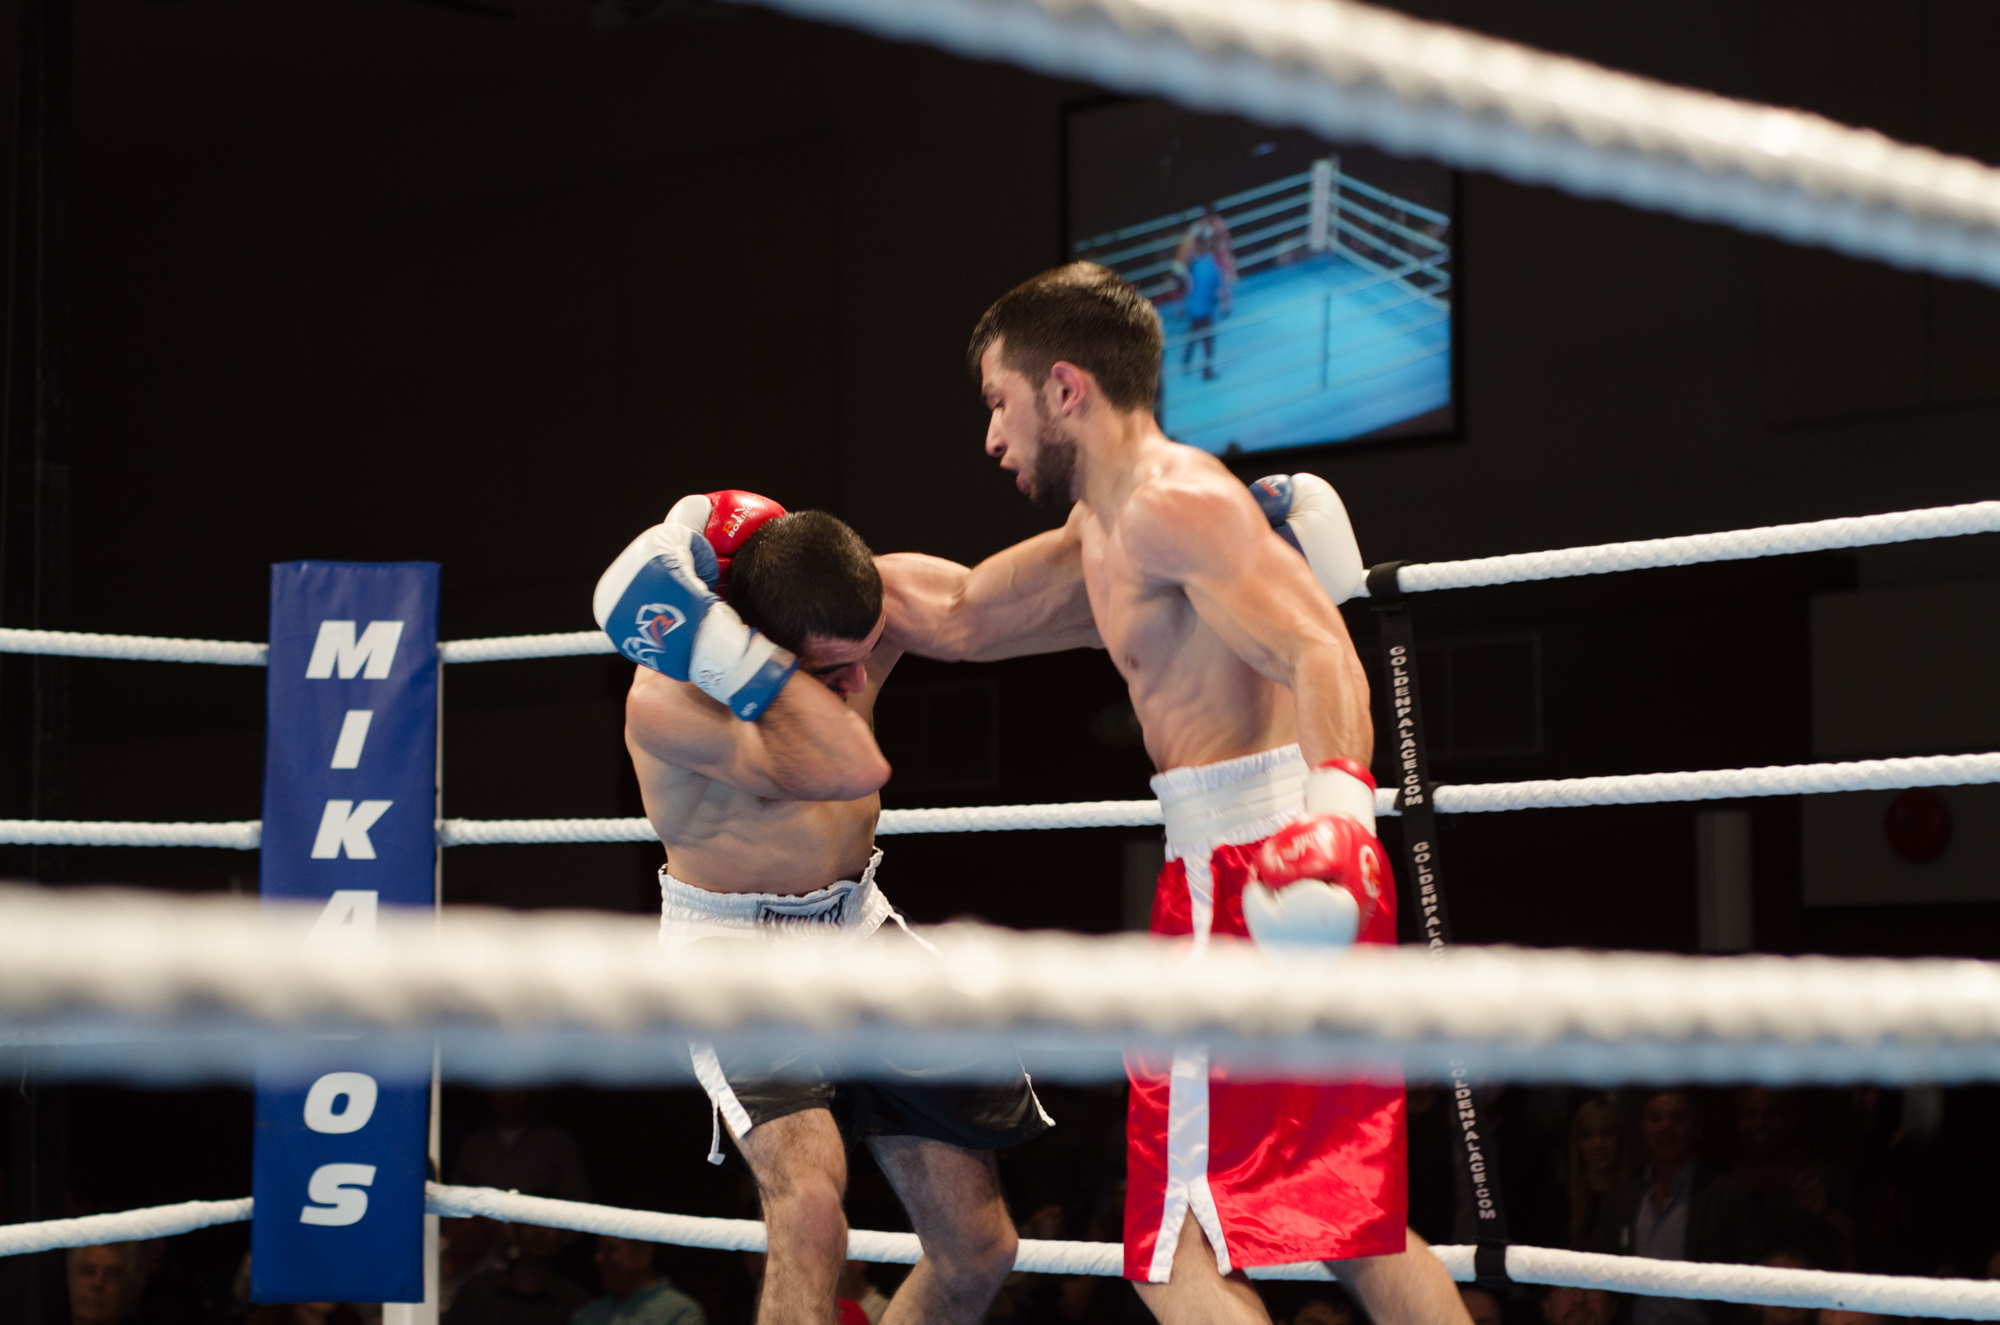 2014 11-6 Ali Fight ICC-129.jpg